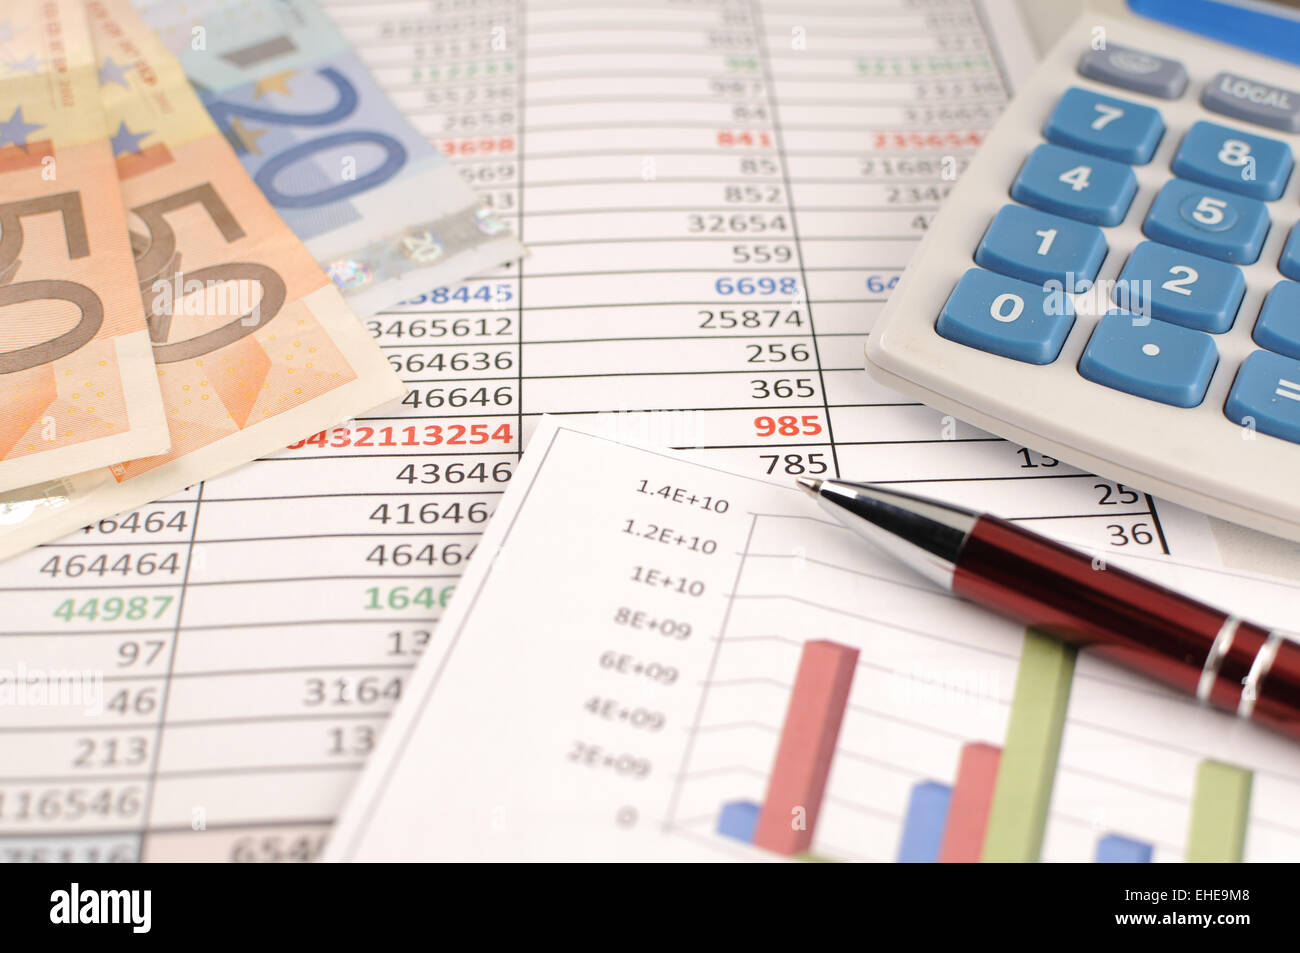 Business Programs - Stock Image